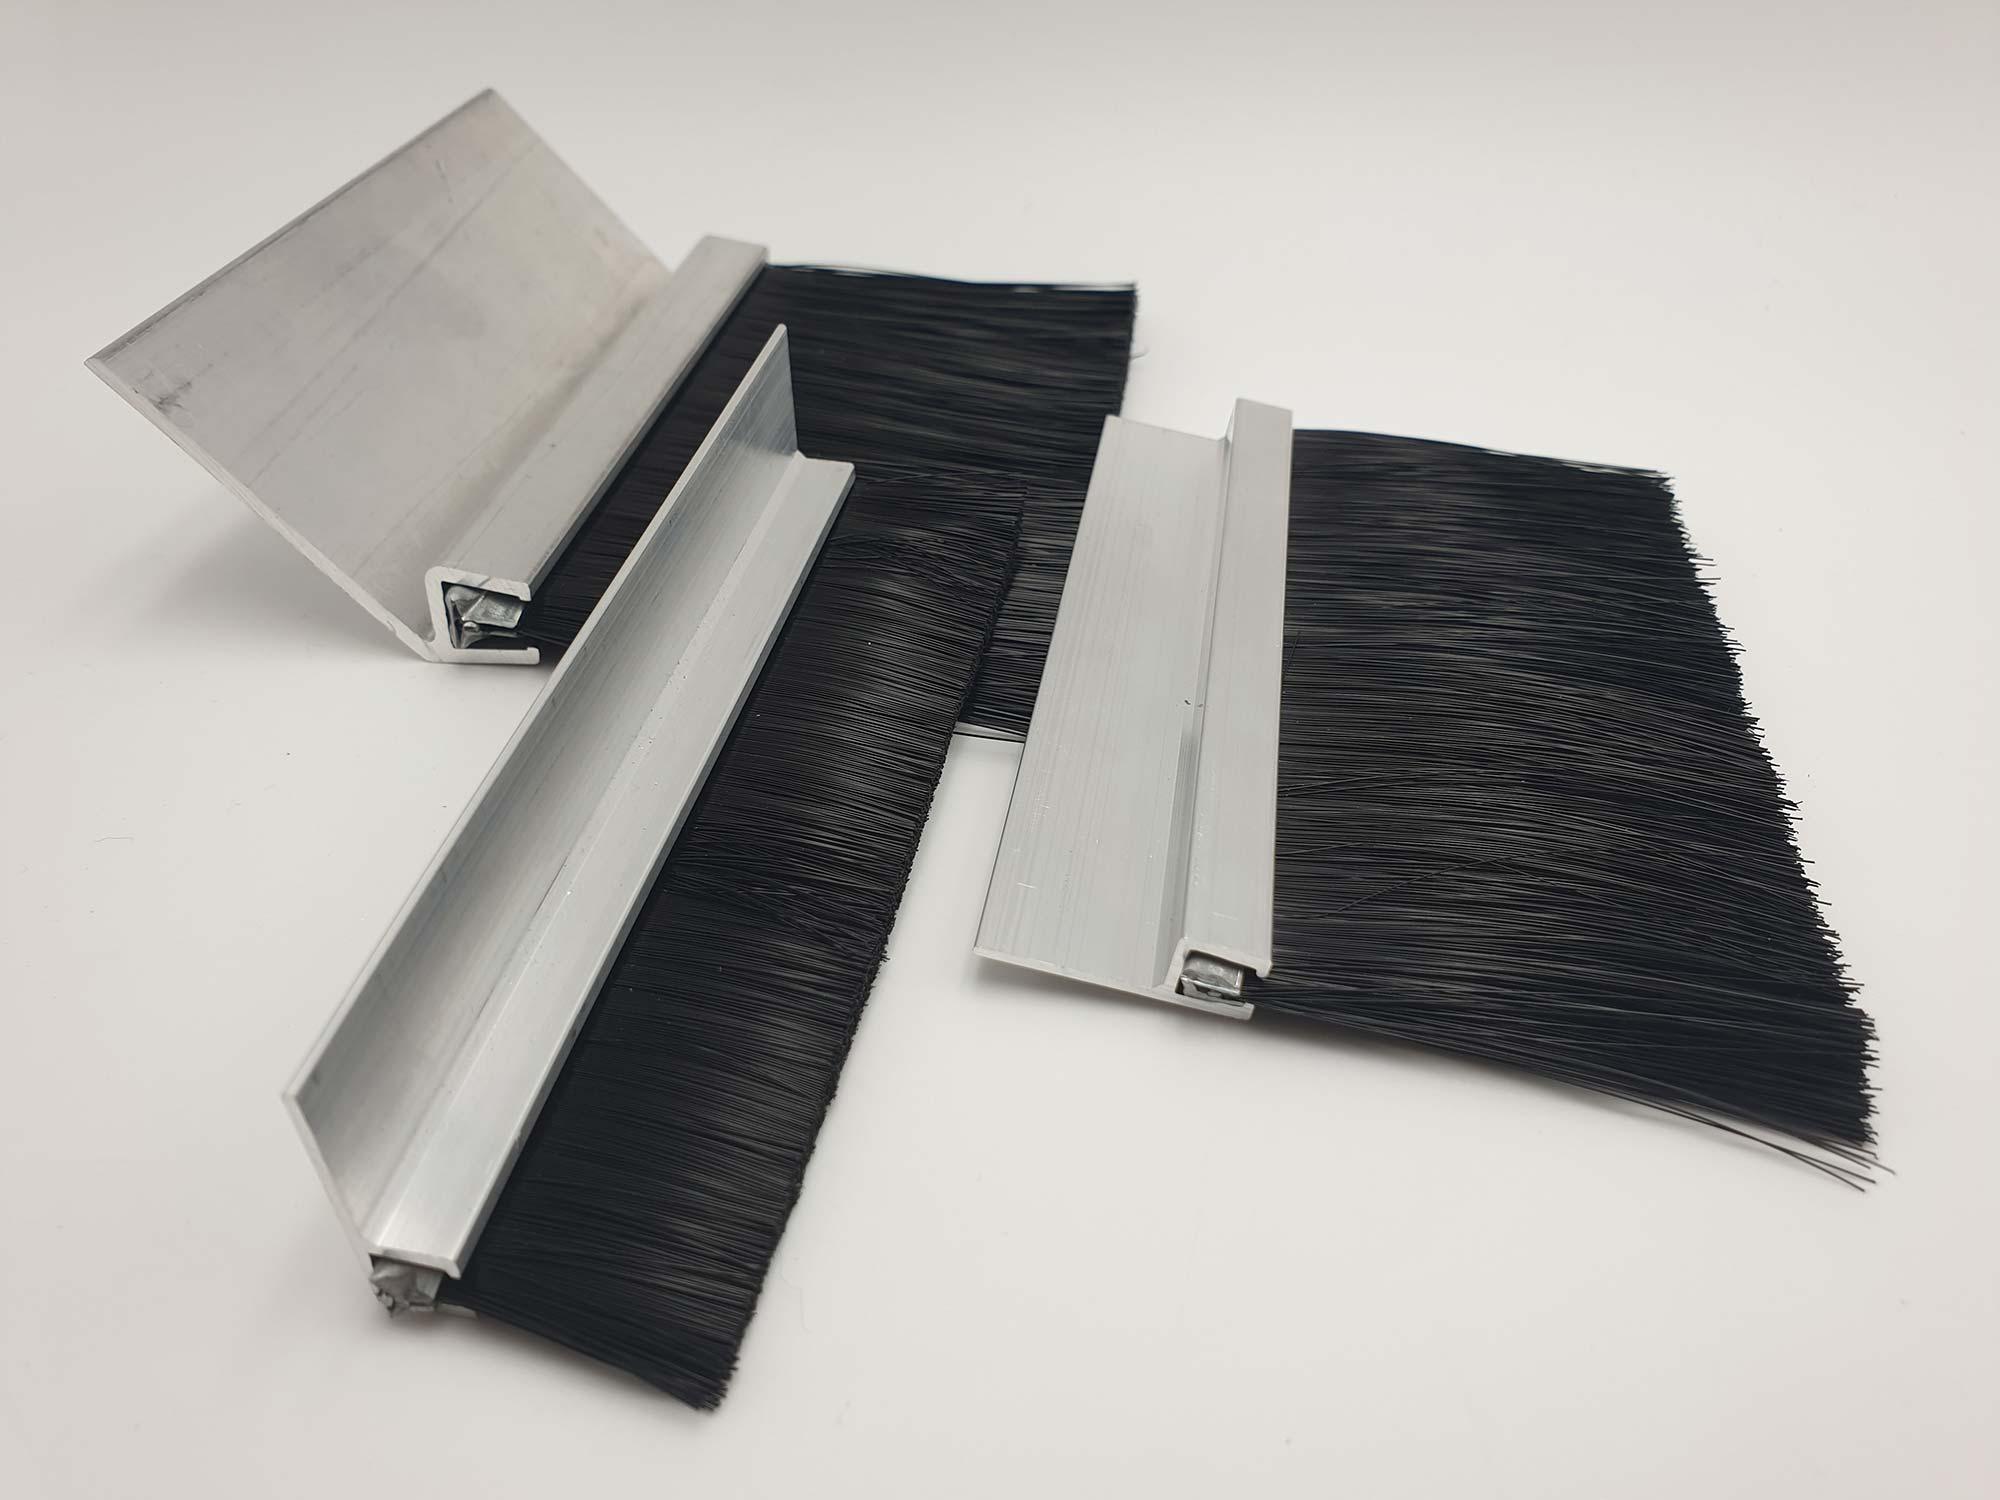 Cepillo Strip Industrial - Burletes - Cepillo Técnico